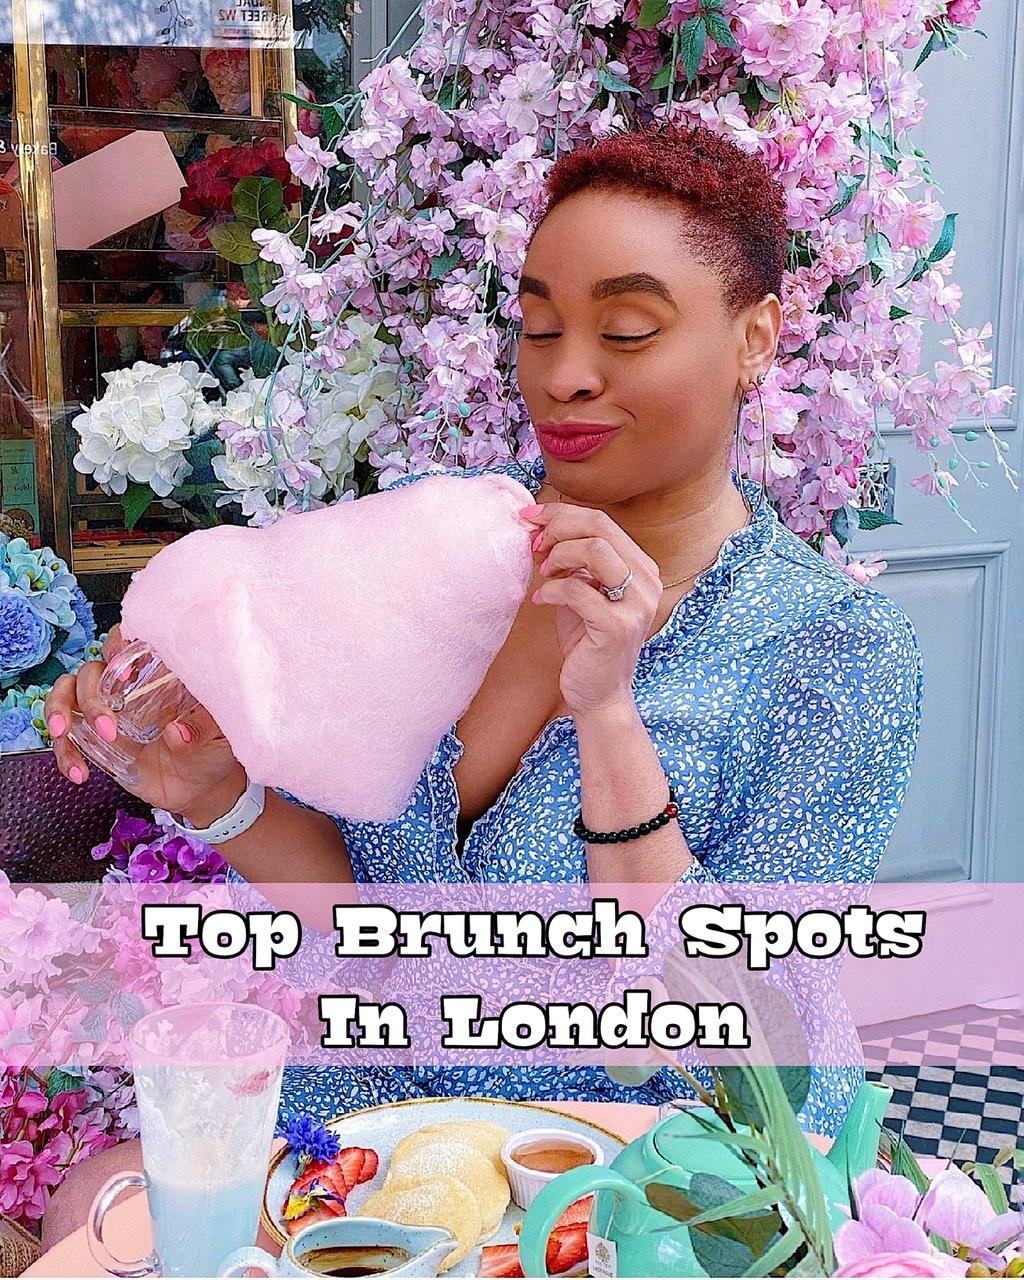 LONDON BEST BRUNCH SPOTS – aesthetics, rooftops et al